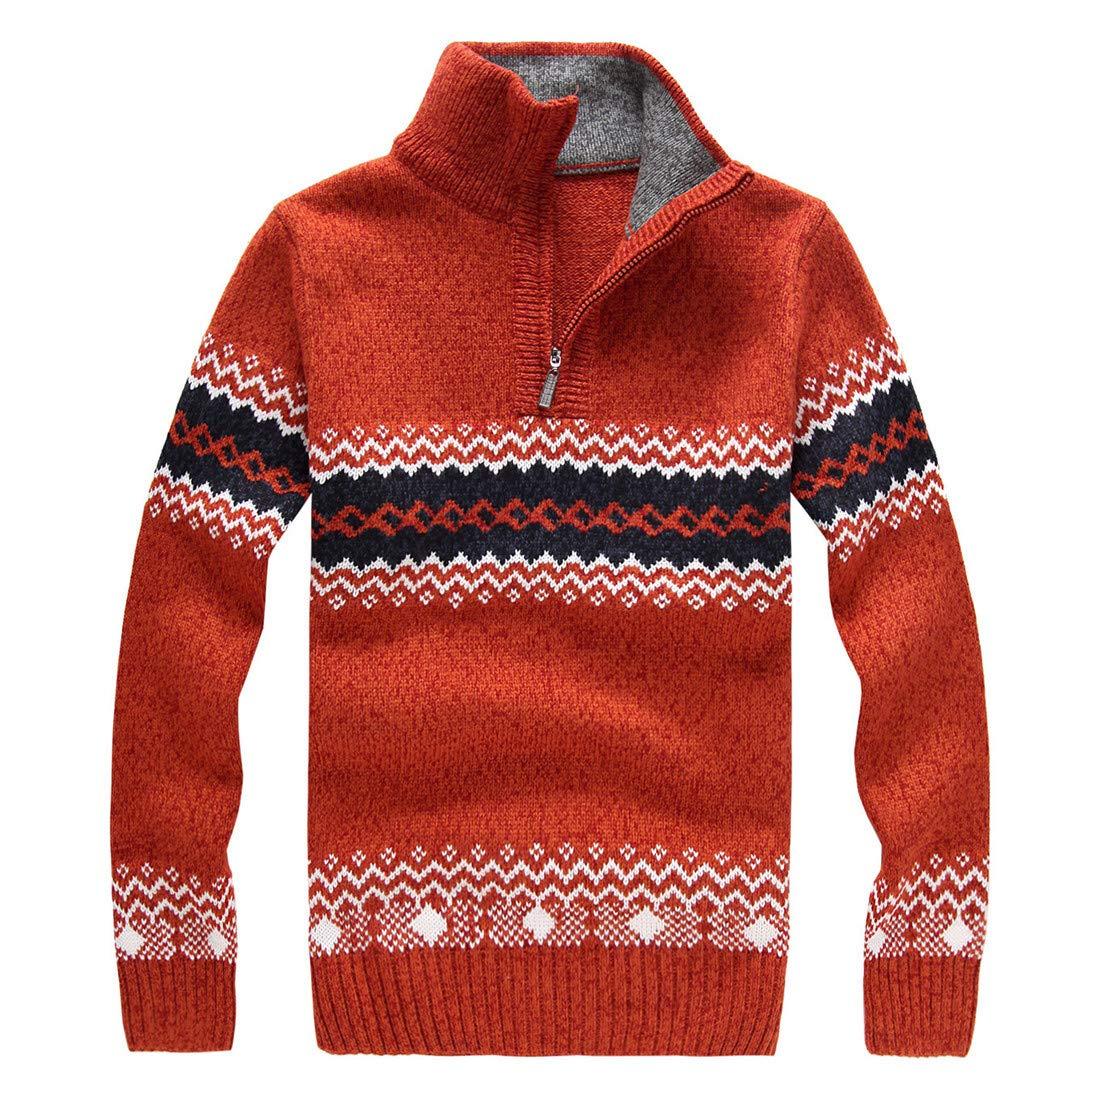 CAI&HONG-GUO GCH Pullover mit Bodenausschnitt, Männer, schmal, Stehkragen